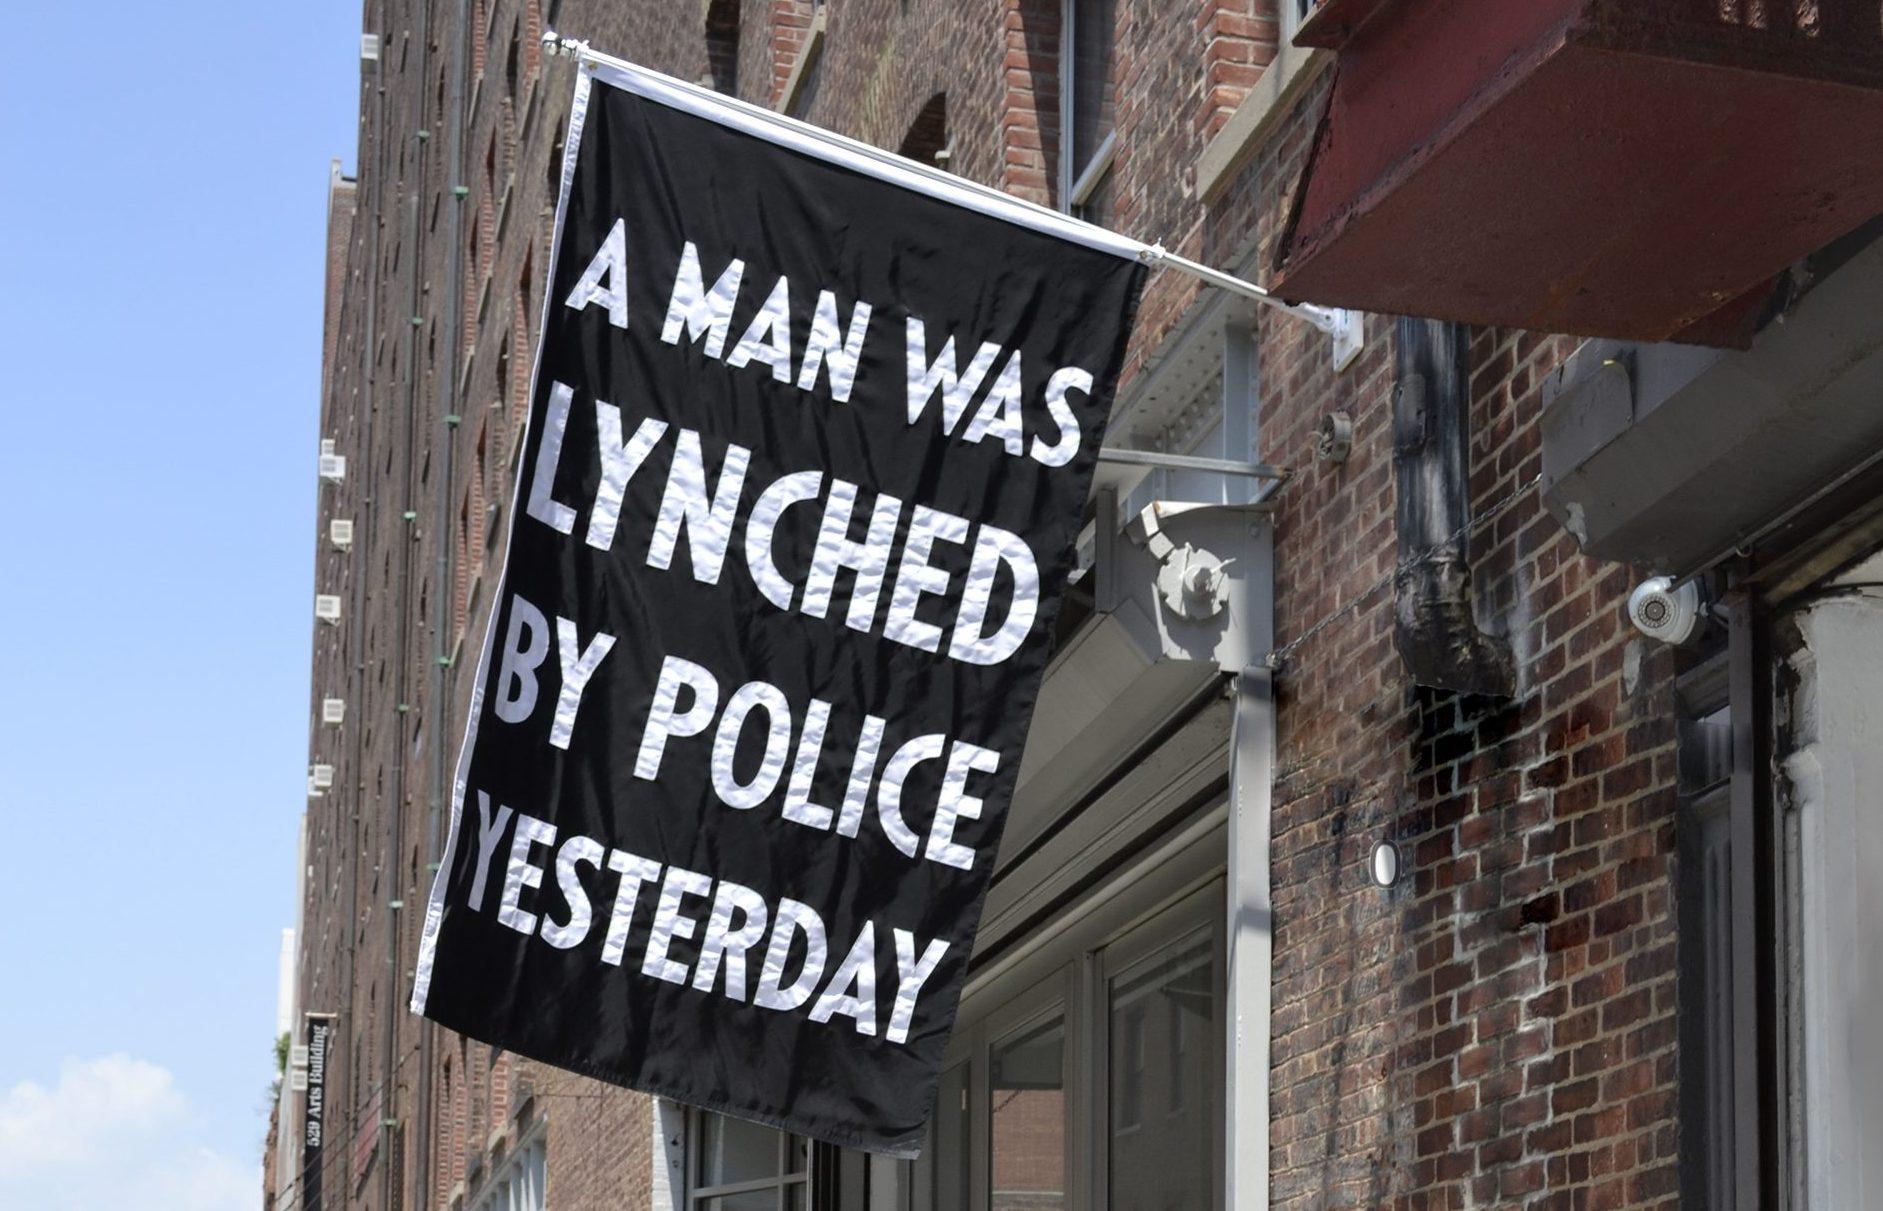 A-Man-Was-Lynched-shainman-